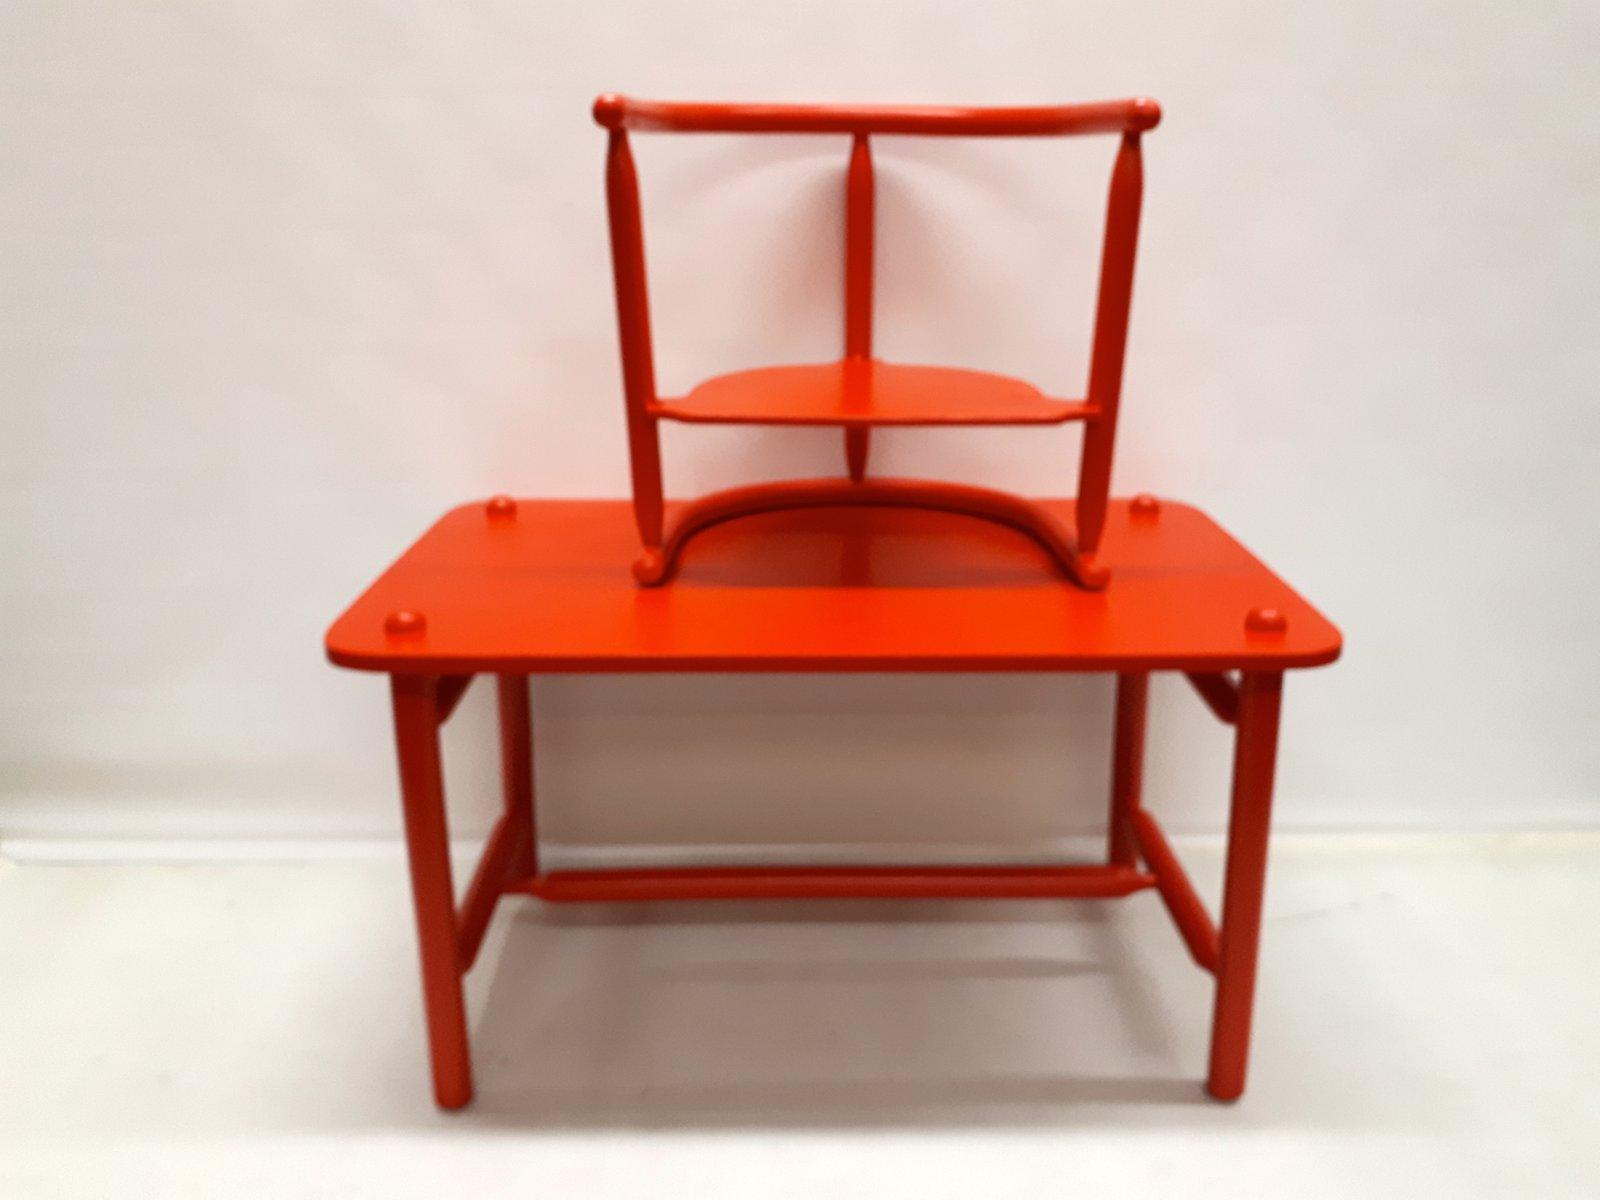 Scrivania e sedia anna di karin mobring per ikea in vendita